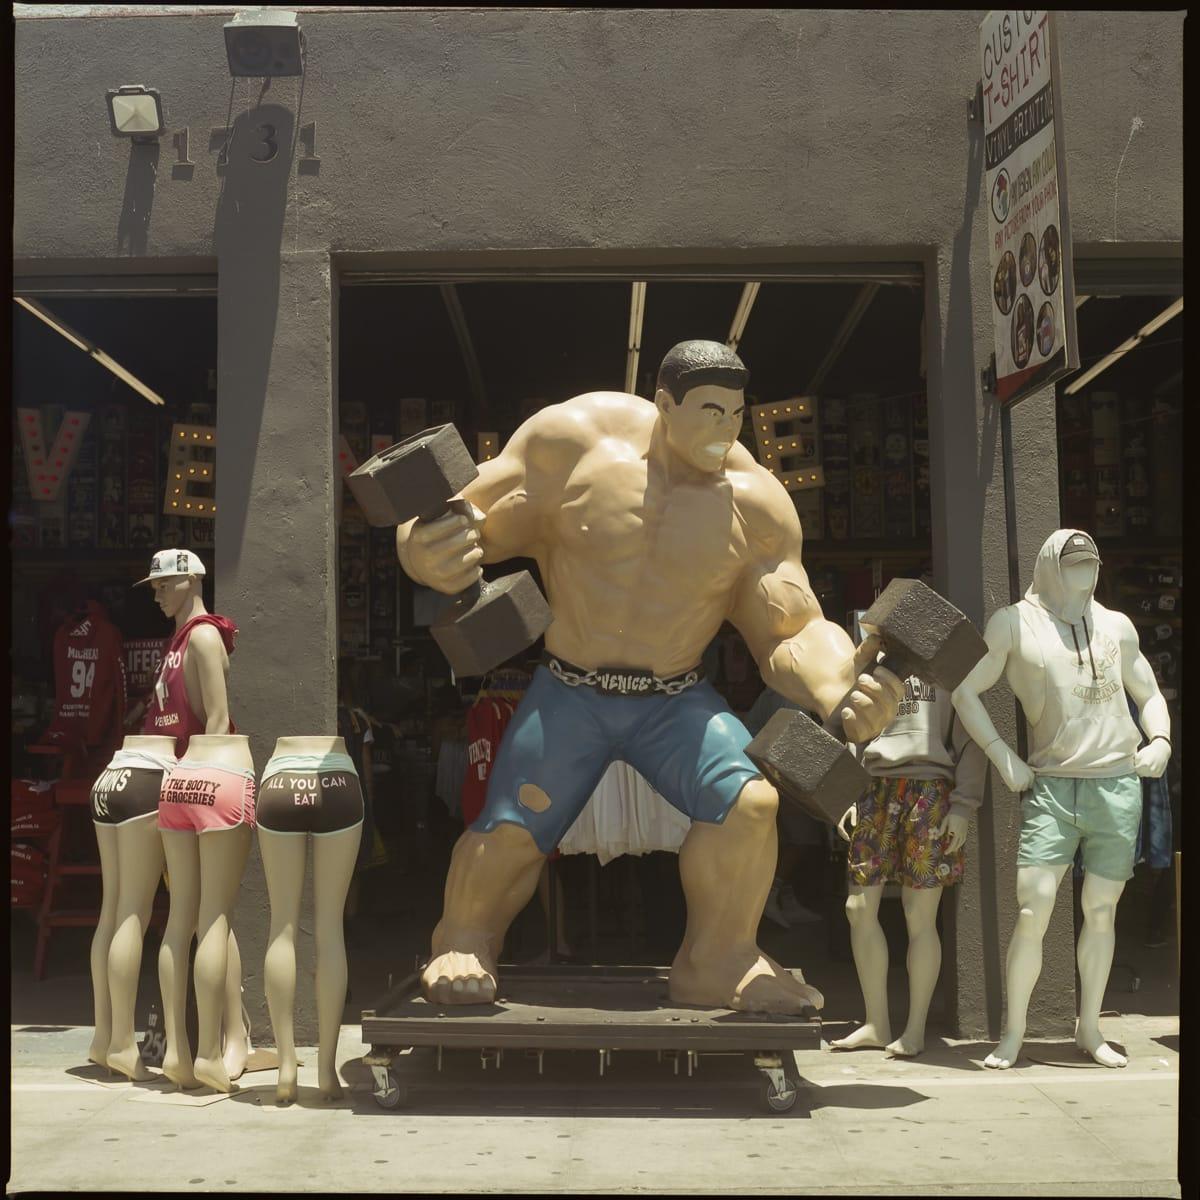 Hulk like bodybuilder